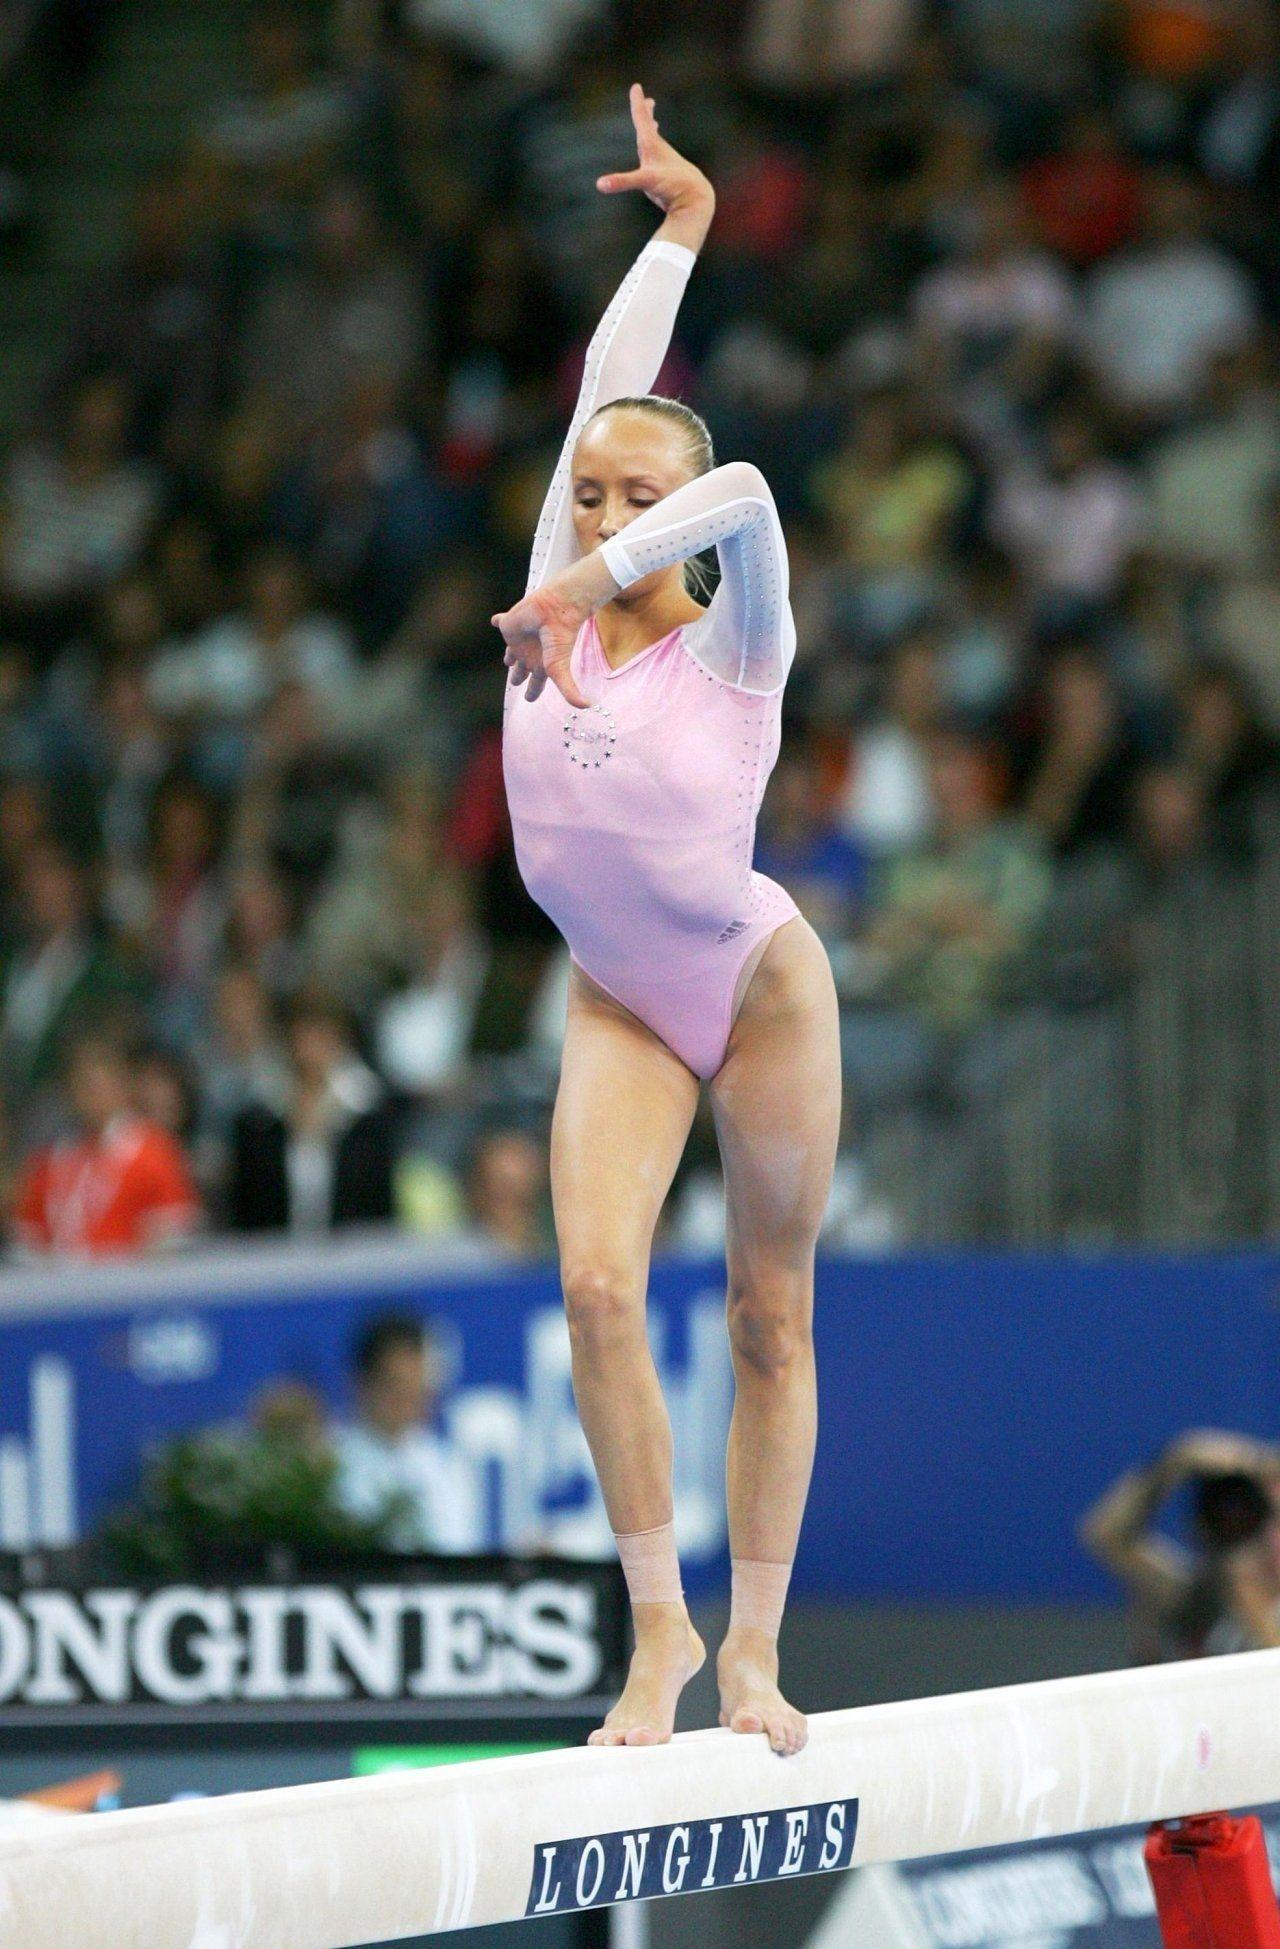 Image forward roll jpg gymnastics wiki - Nastia Liukin On Balance Beam Olympic Gymnast Gymnastics P 1 1 Kyfun